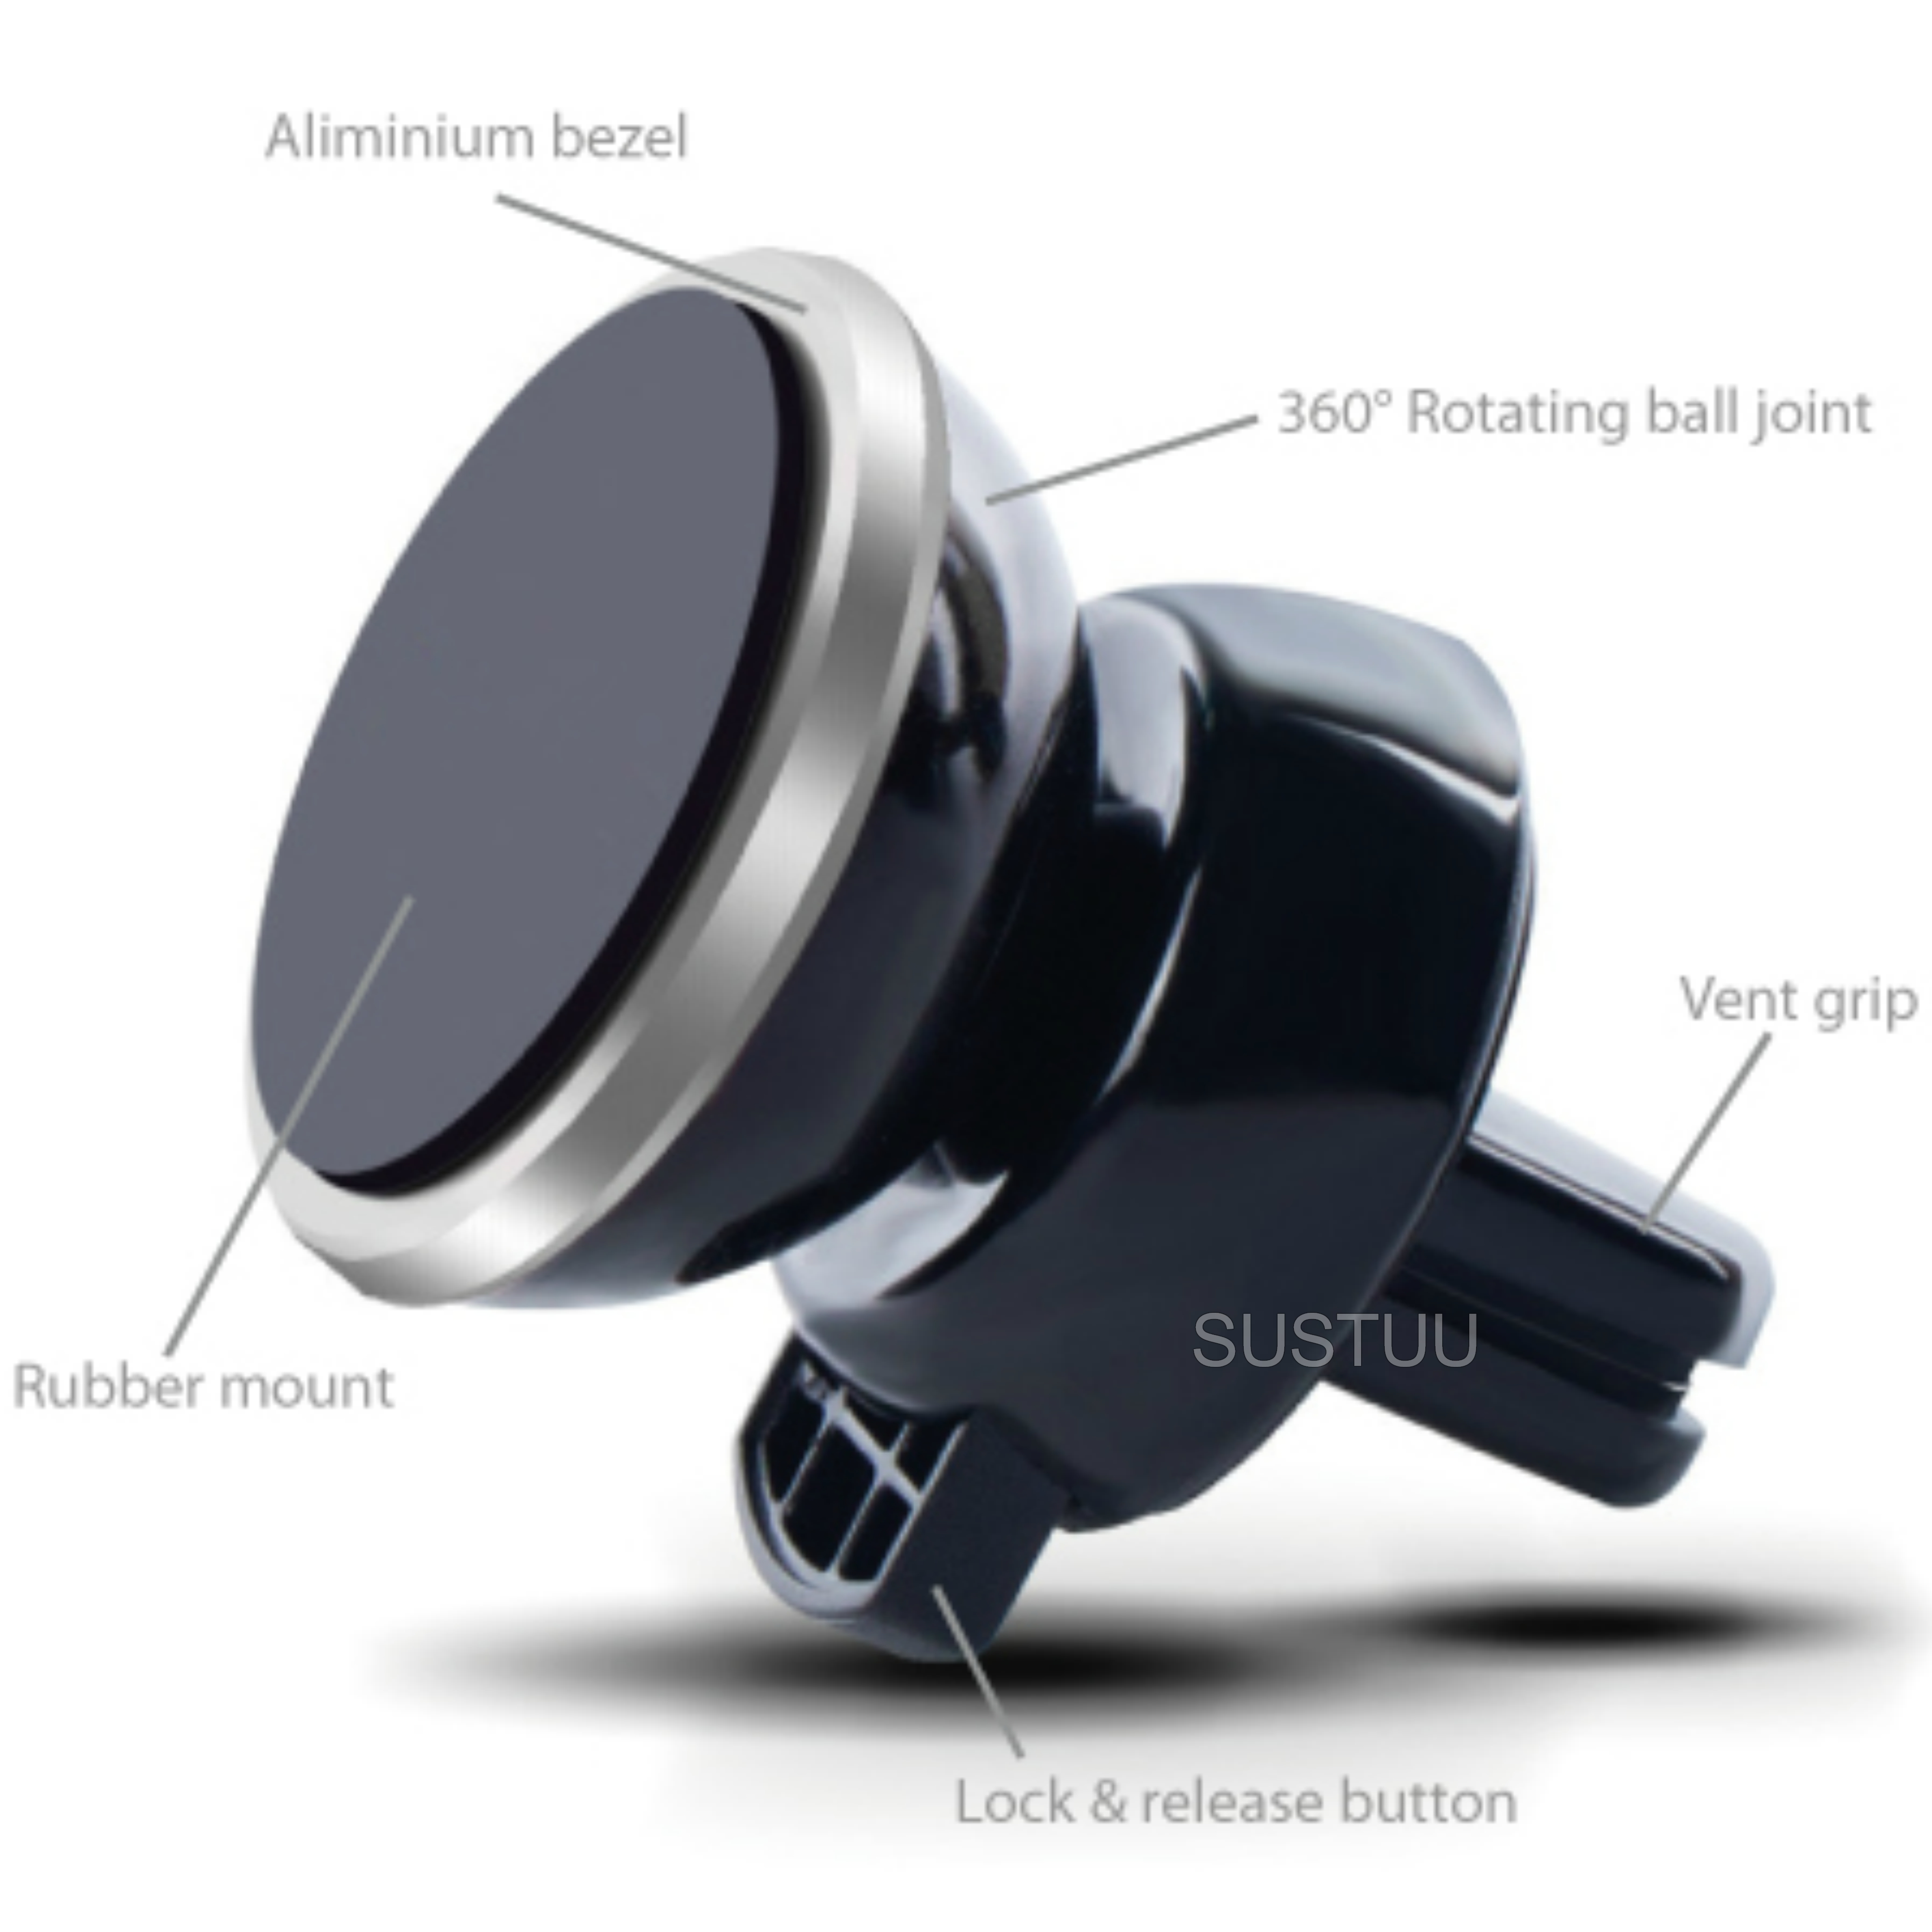 Universal In Car Magnetic Vent Holder/ Mount | For Smartphone - iPhone 6s/ 7 - GPS/ SatNav